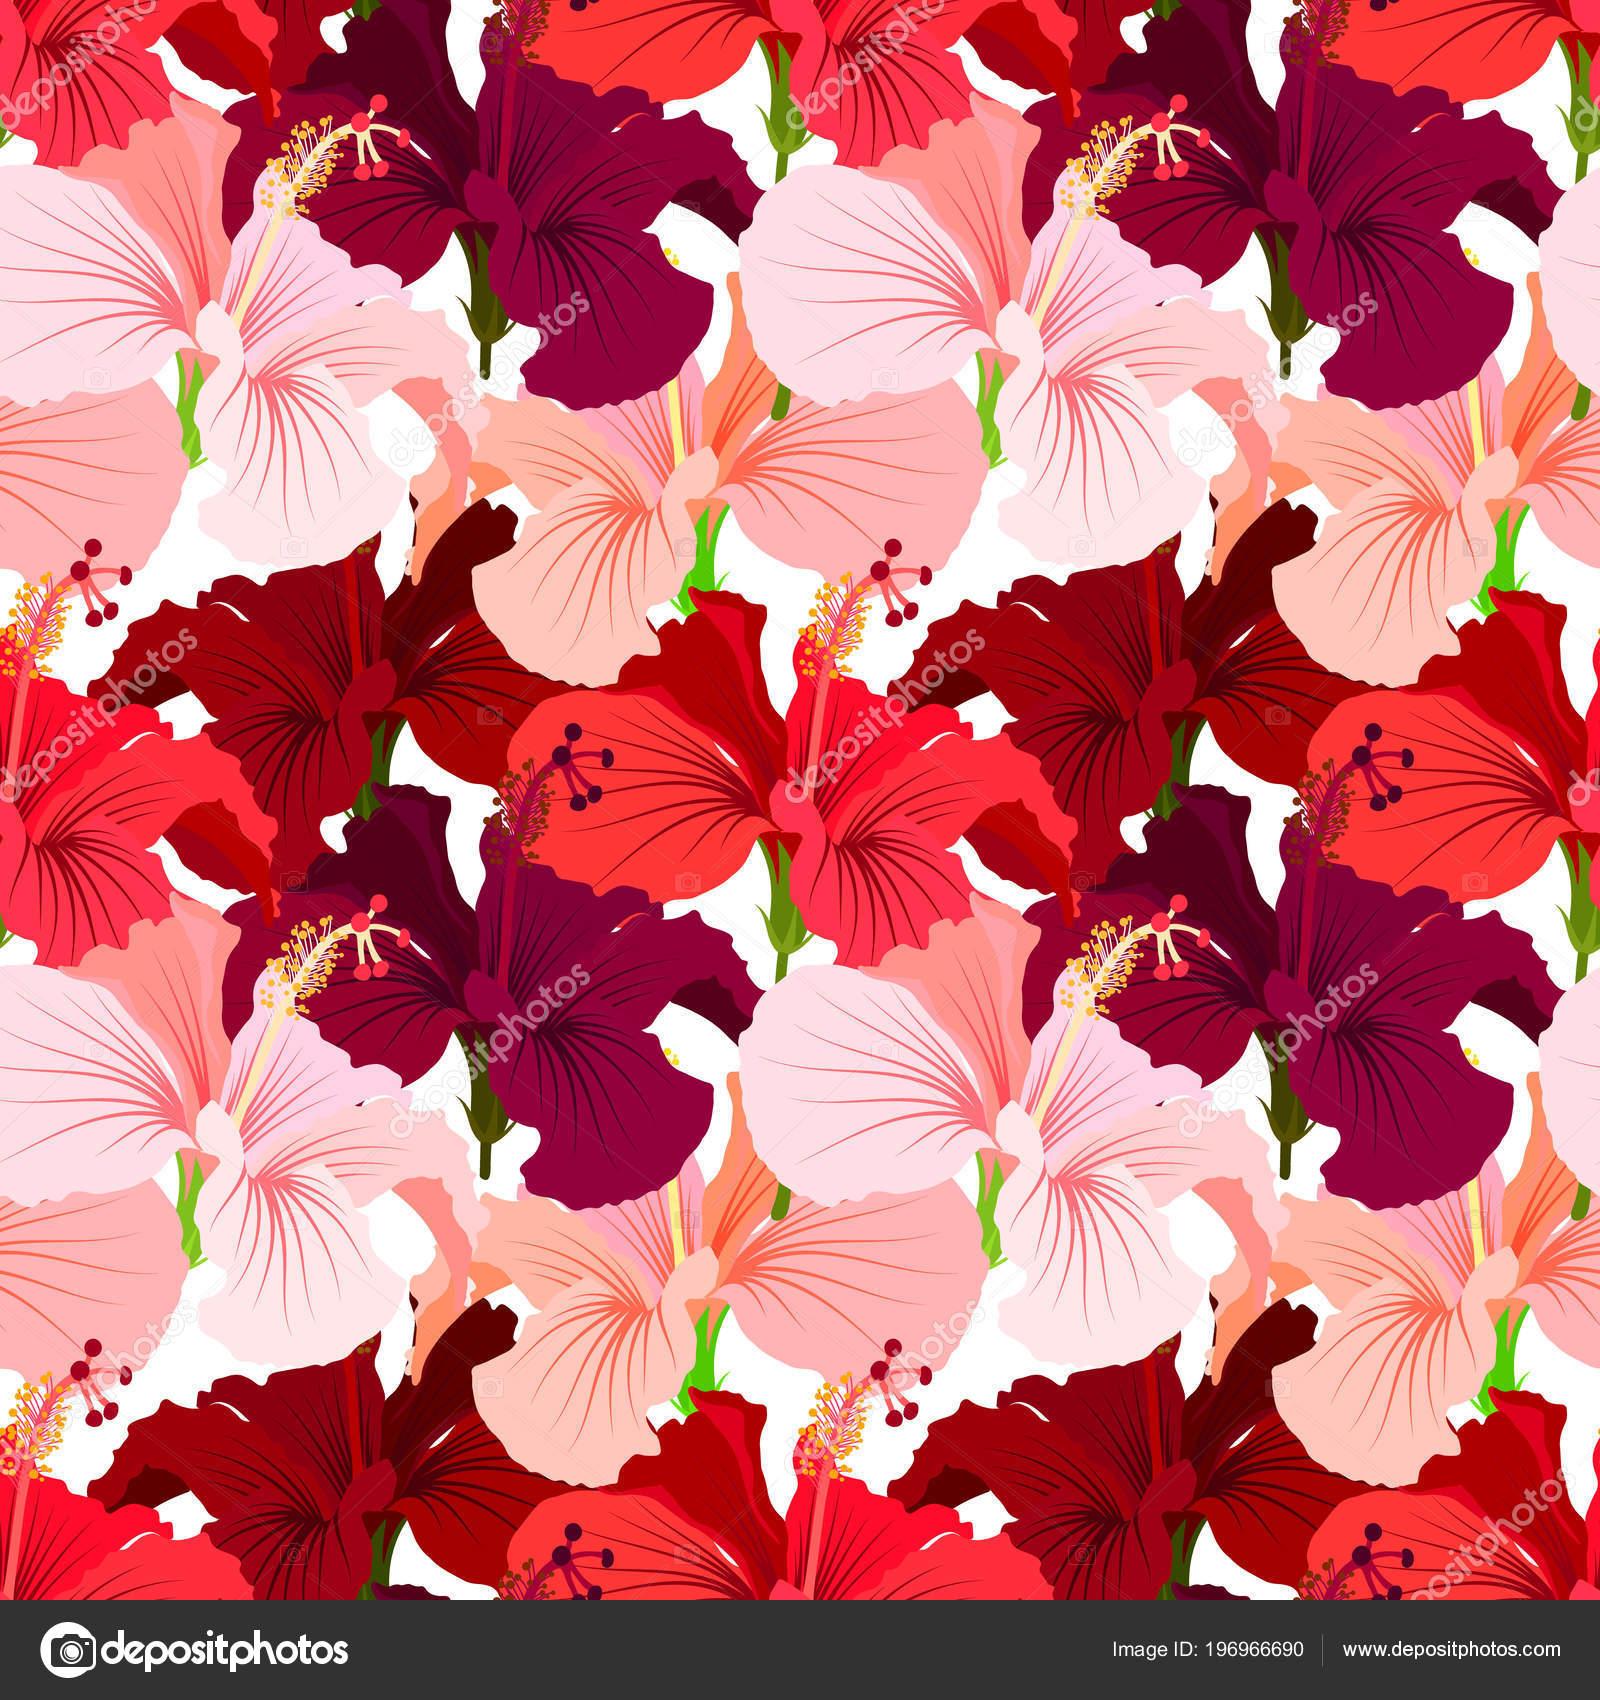 Impression De Fond Belle Jungle Florale Transparente Fond De Fleurs